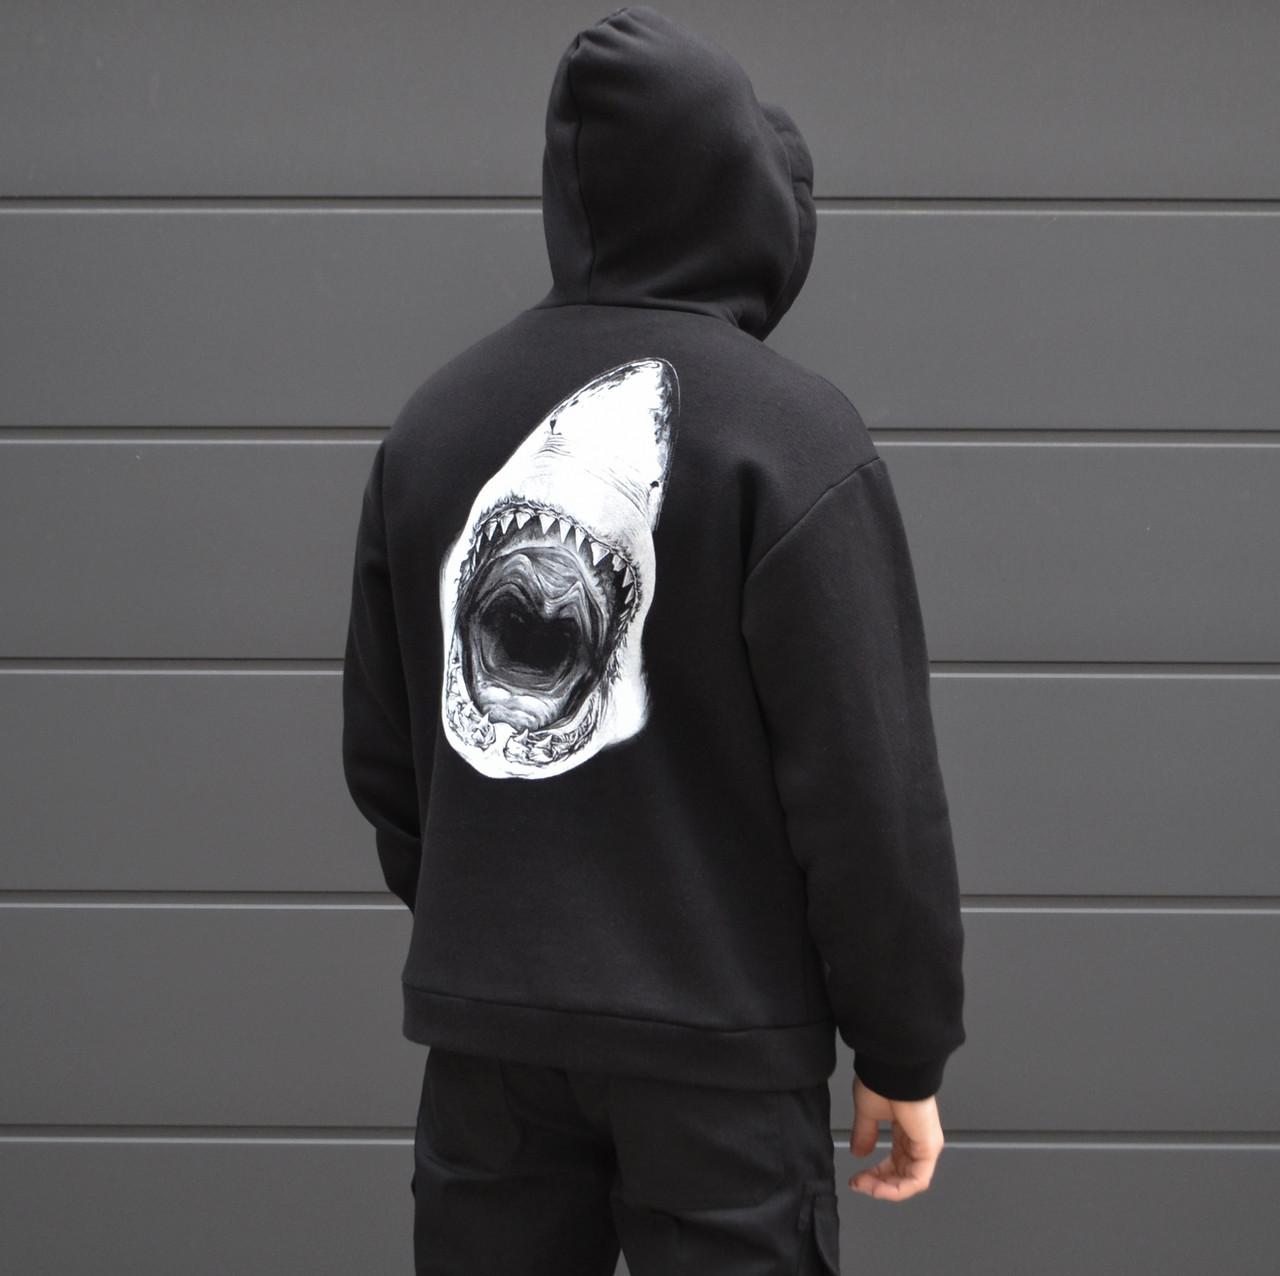 Мужская кофта - Худи Shark - акула, черная